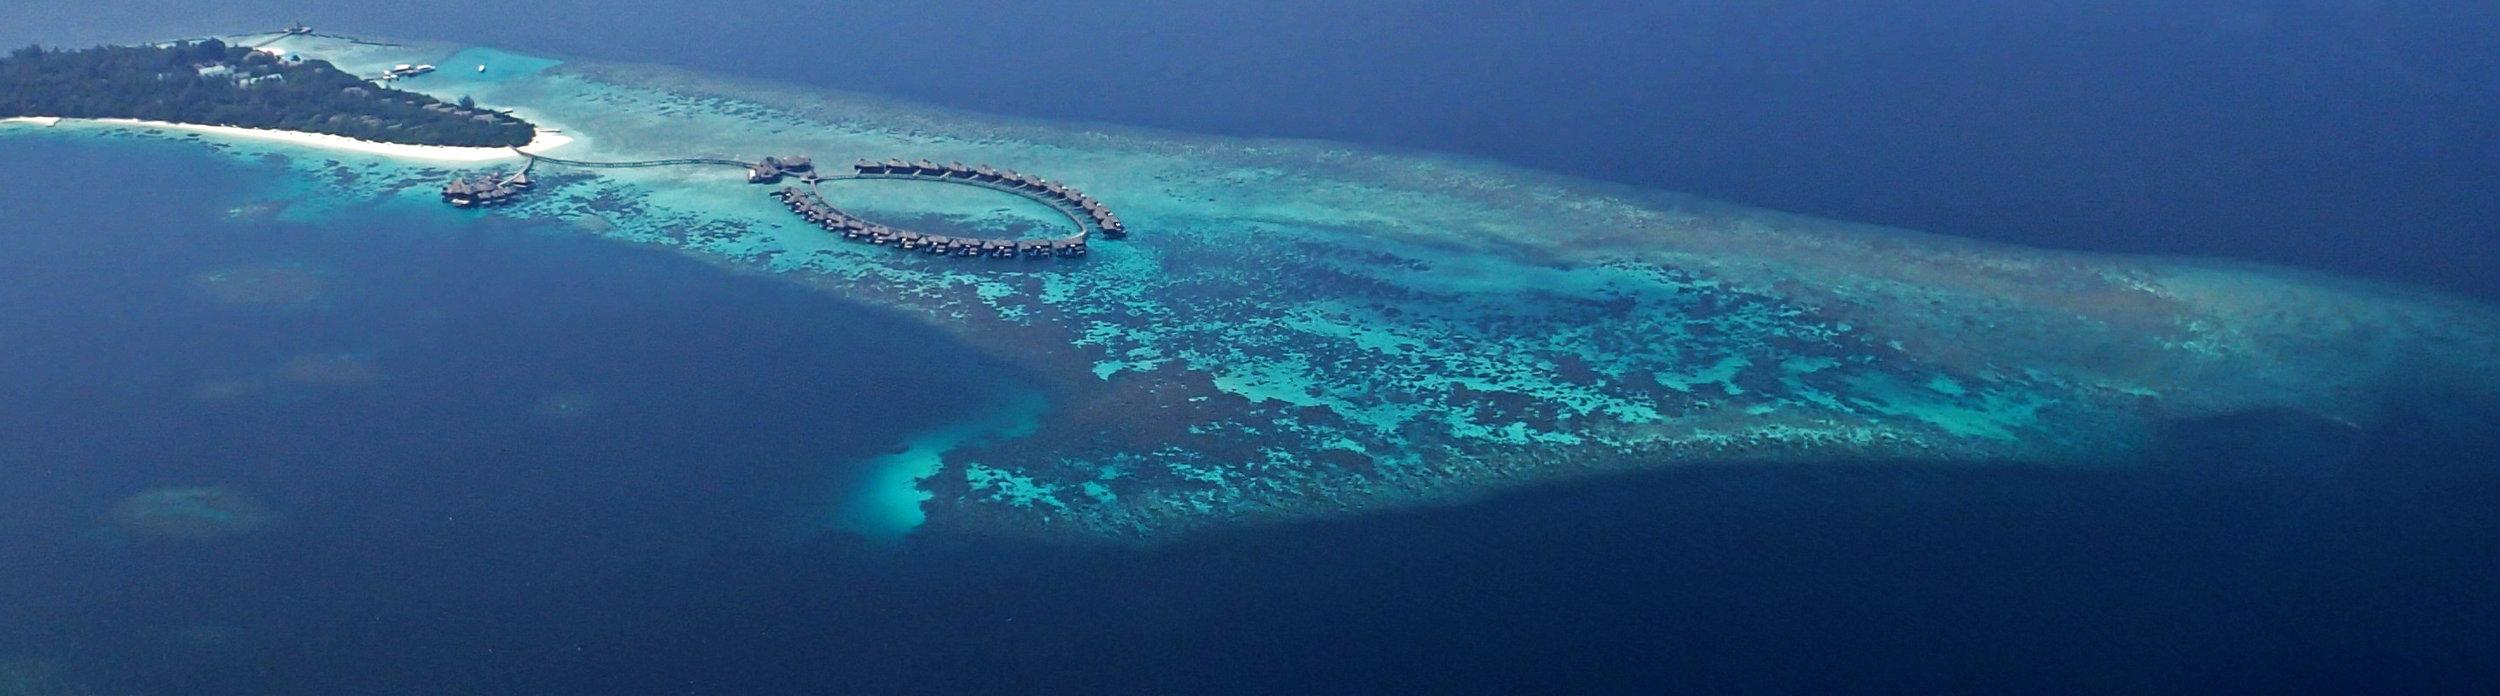 resorts and reefs.jpg